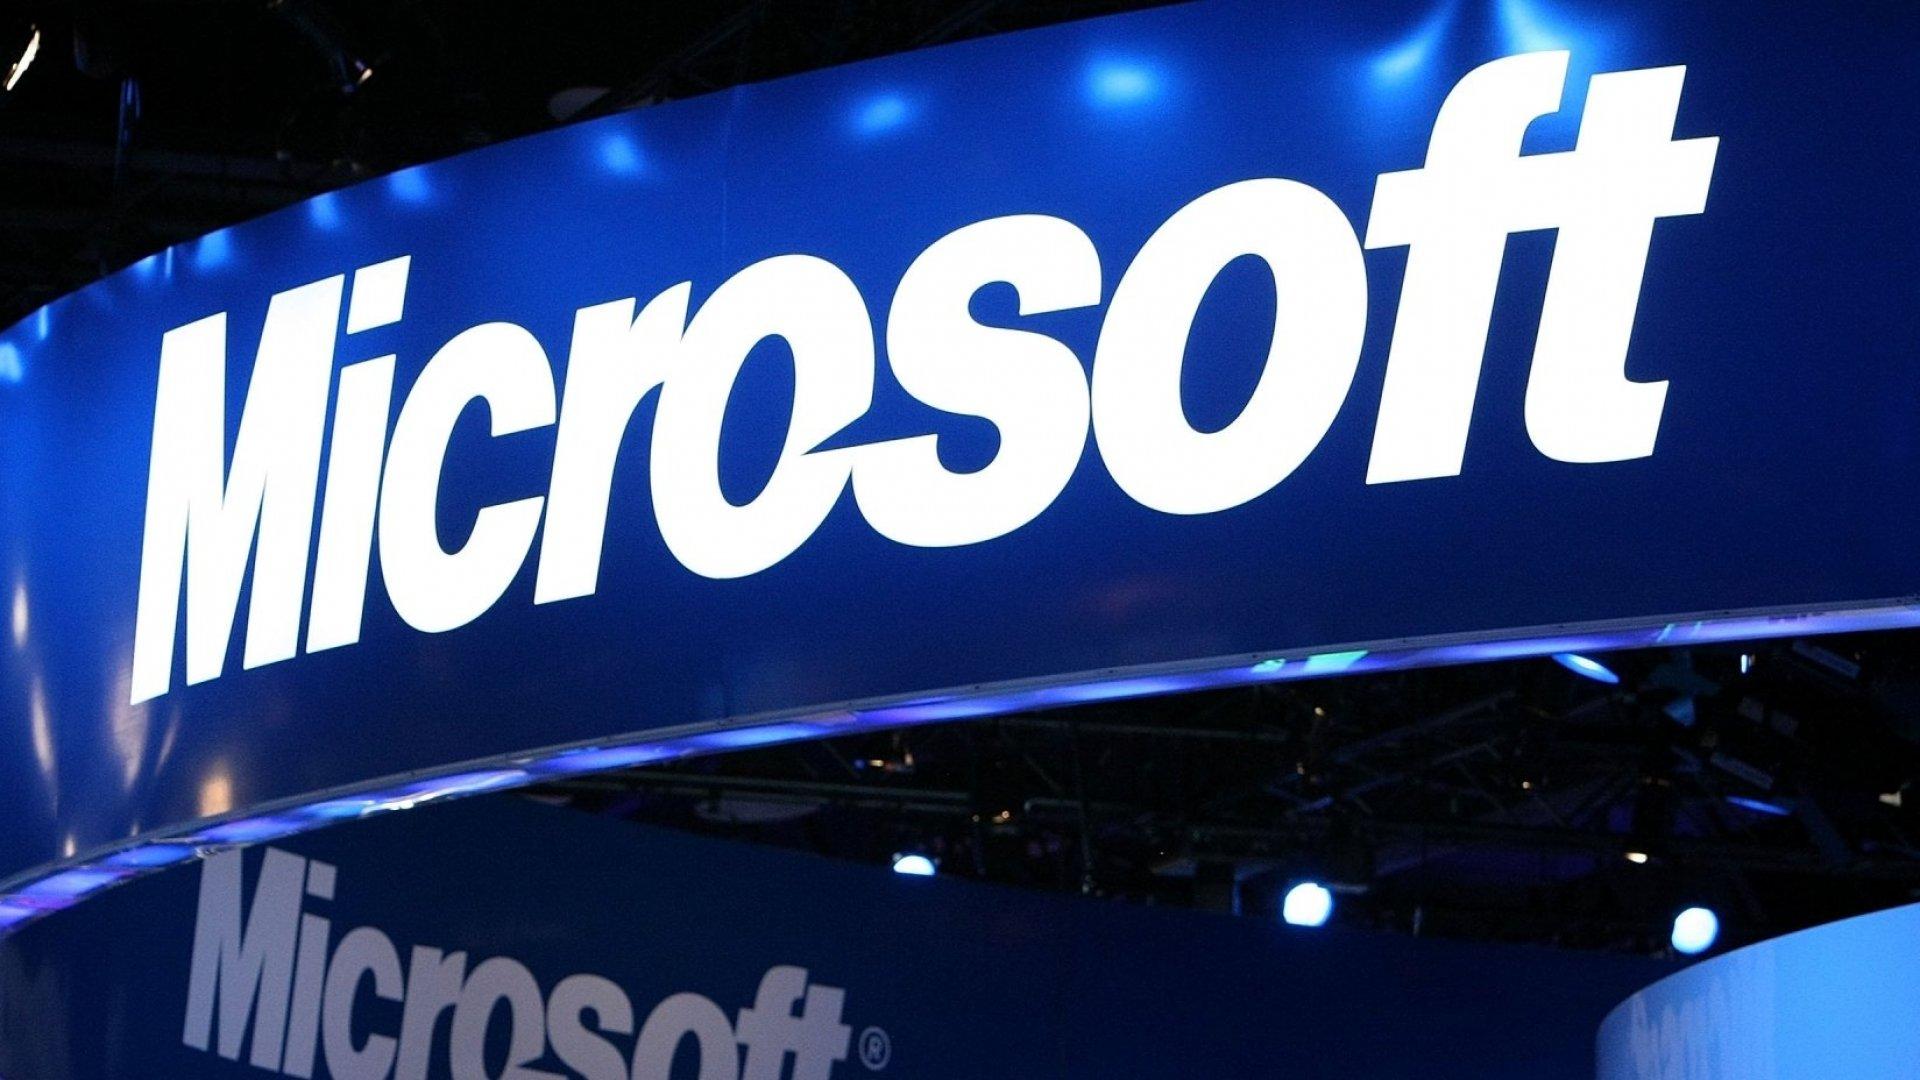 Will Microsoft Break the Internet?